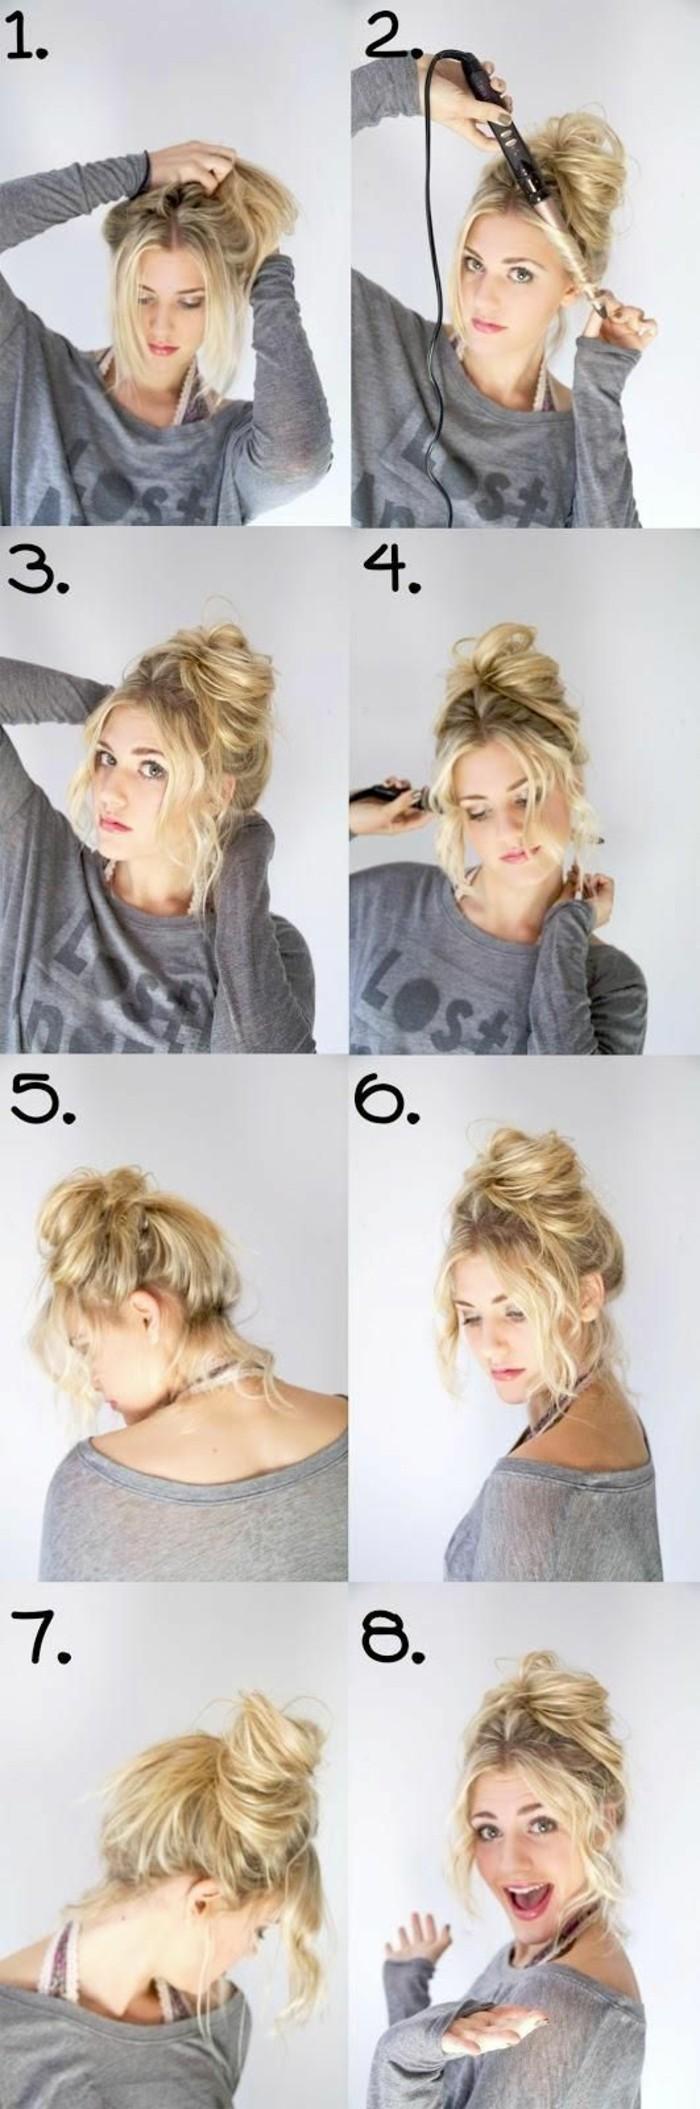 coiffure-mariage-facile-chignon-coiffe-decoiffe-facile-admirations